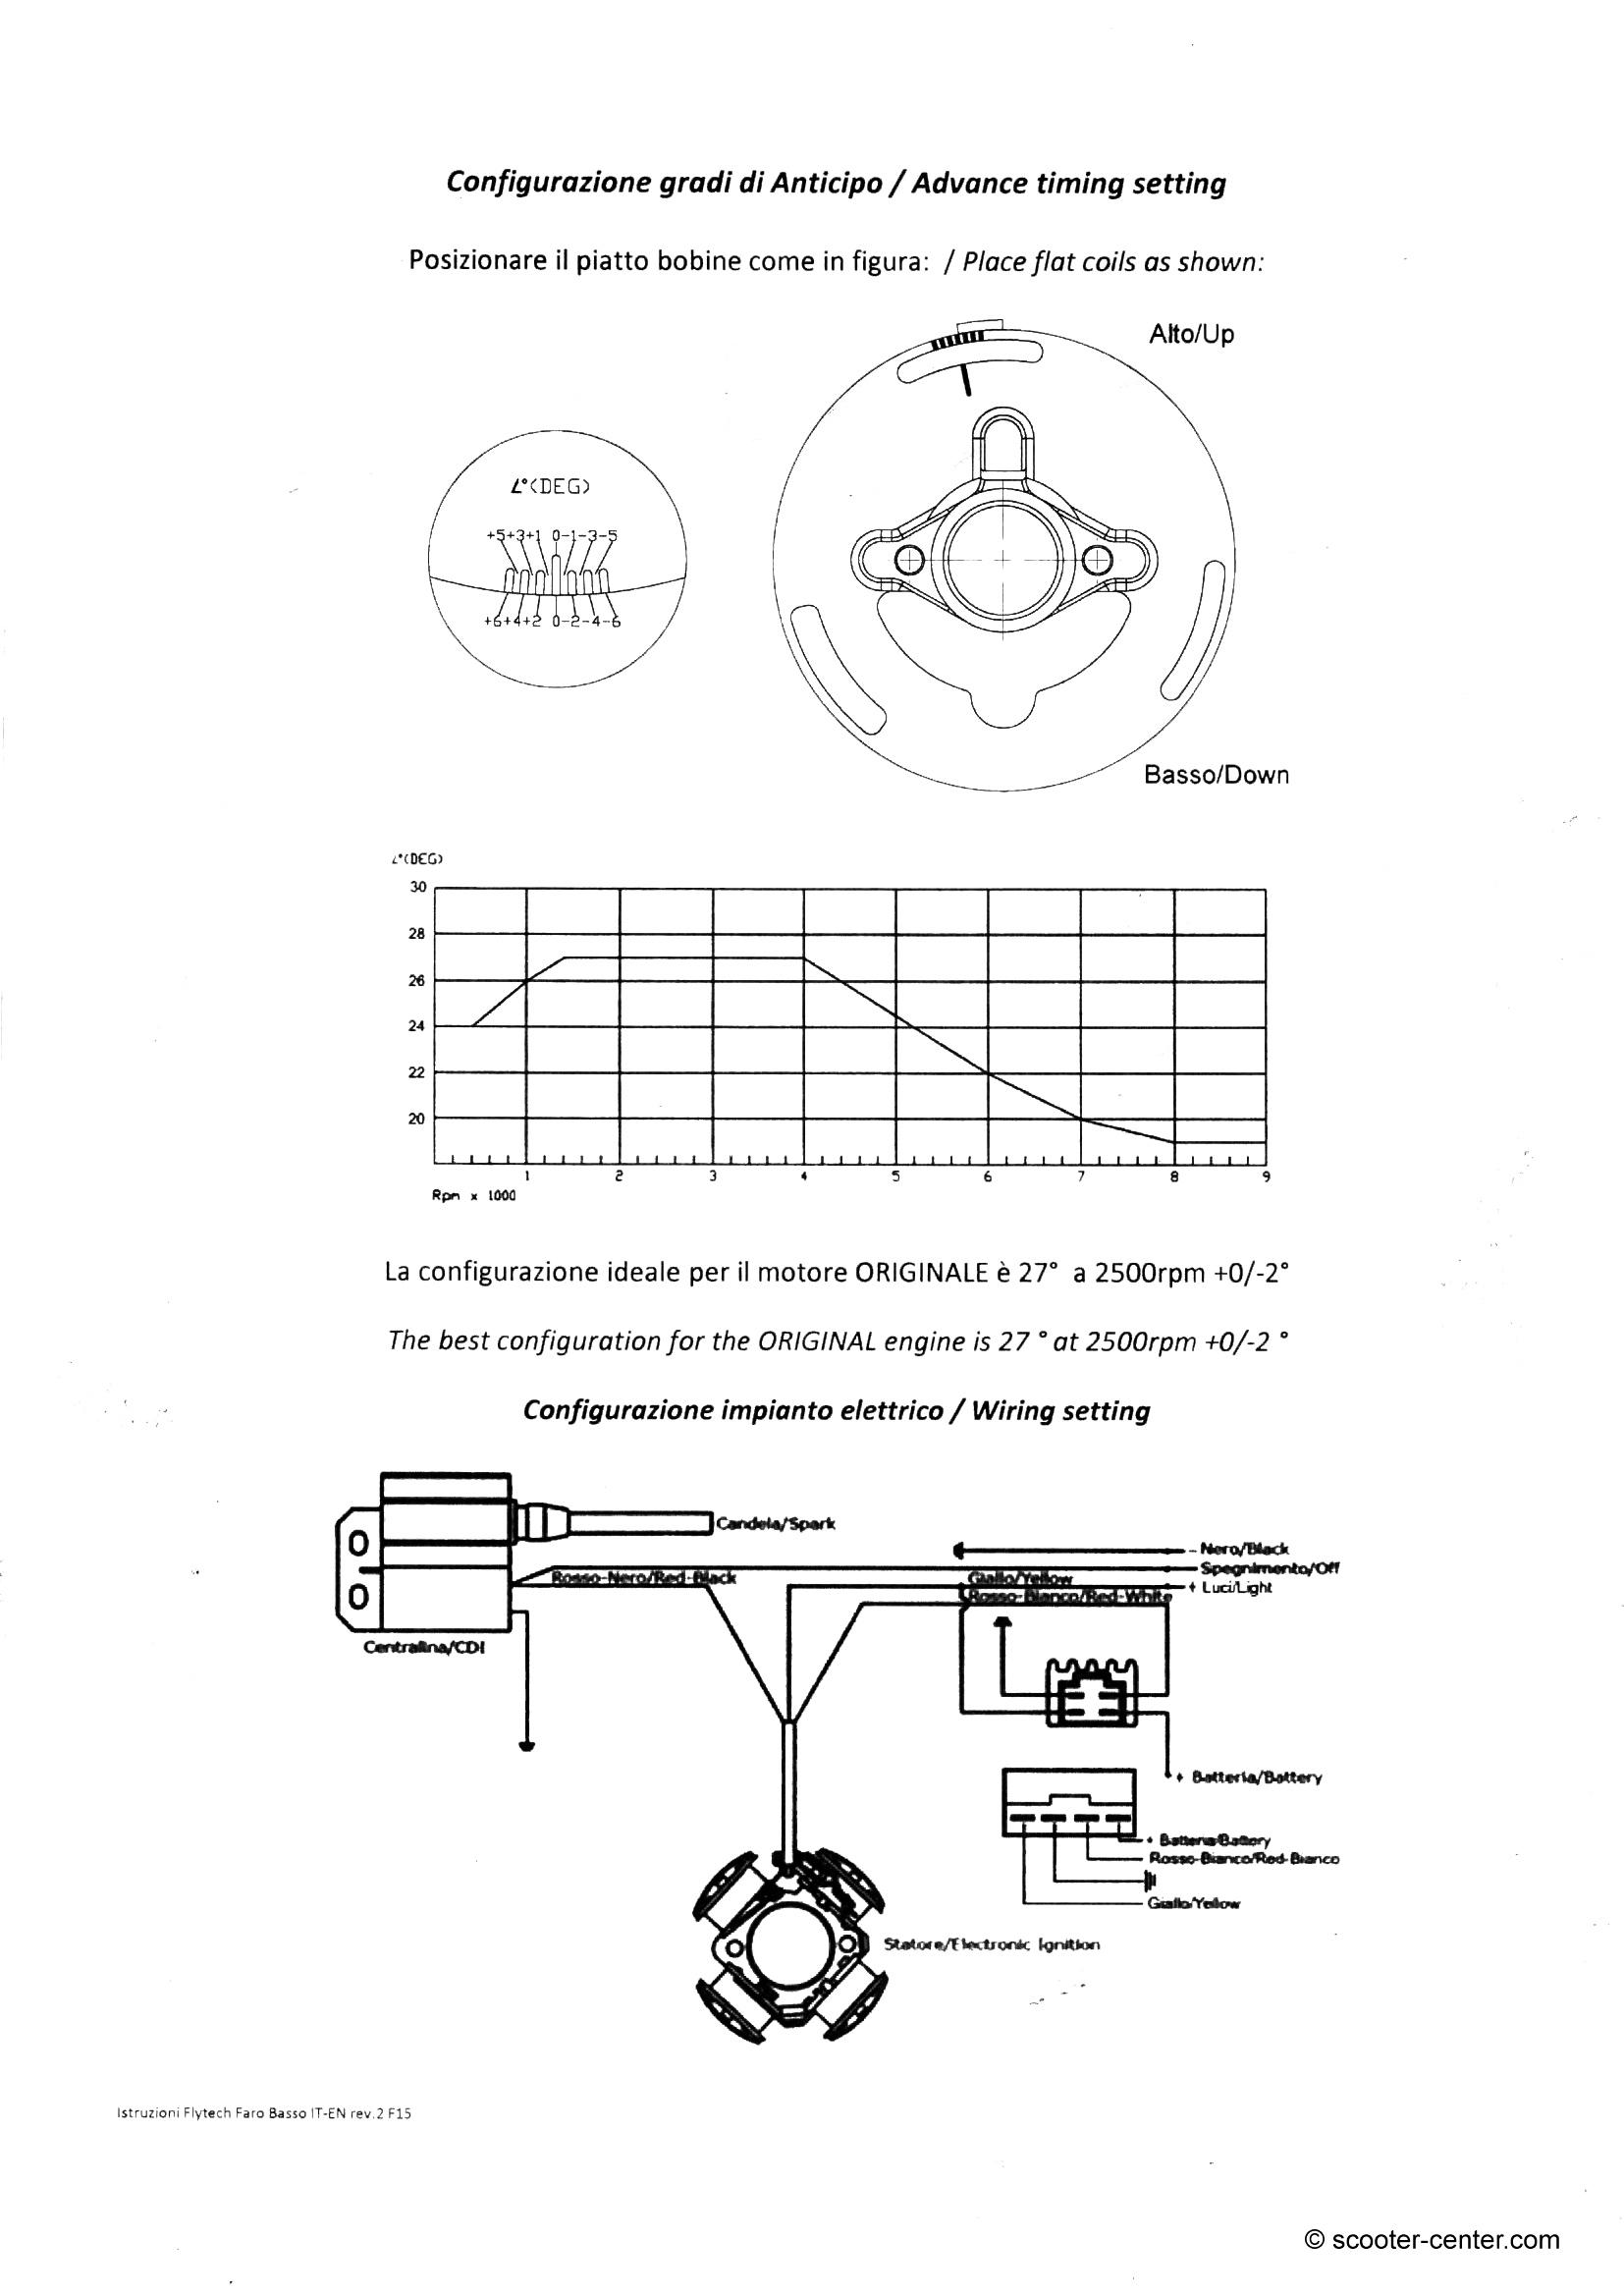 Ignition -PINASCO Flytech- Vespa Wideframe V15-33, VM, VN, ACMA, VB1 ...